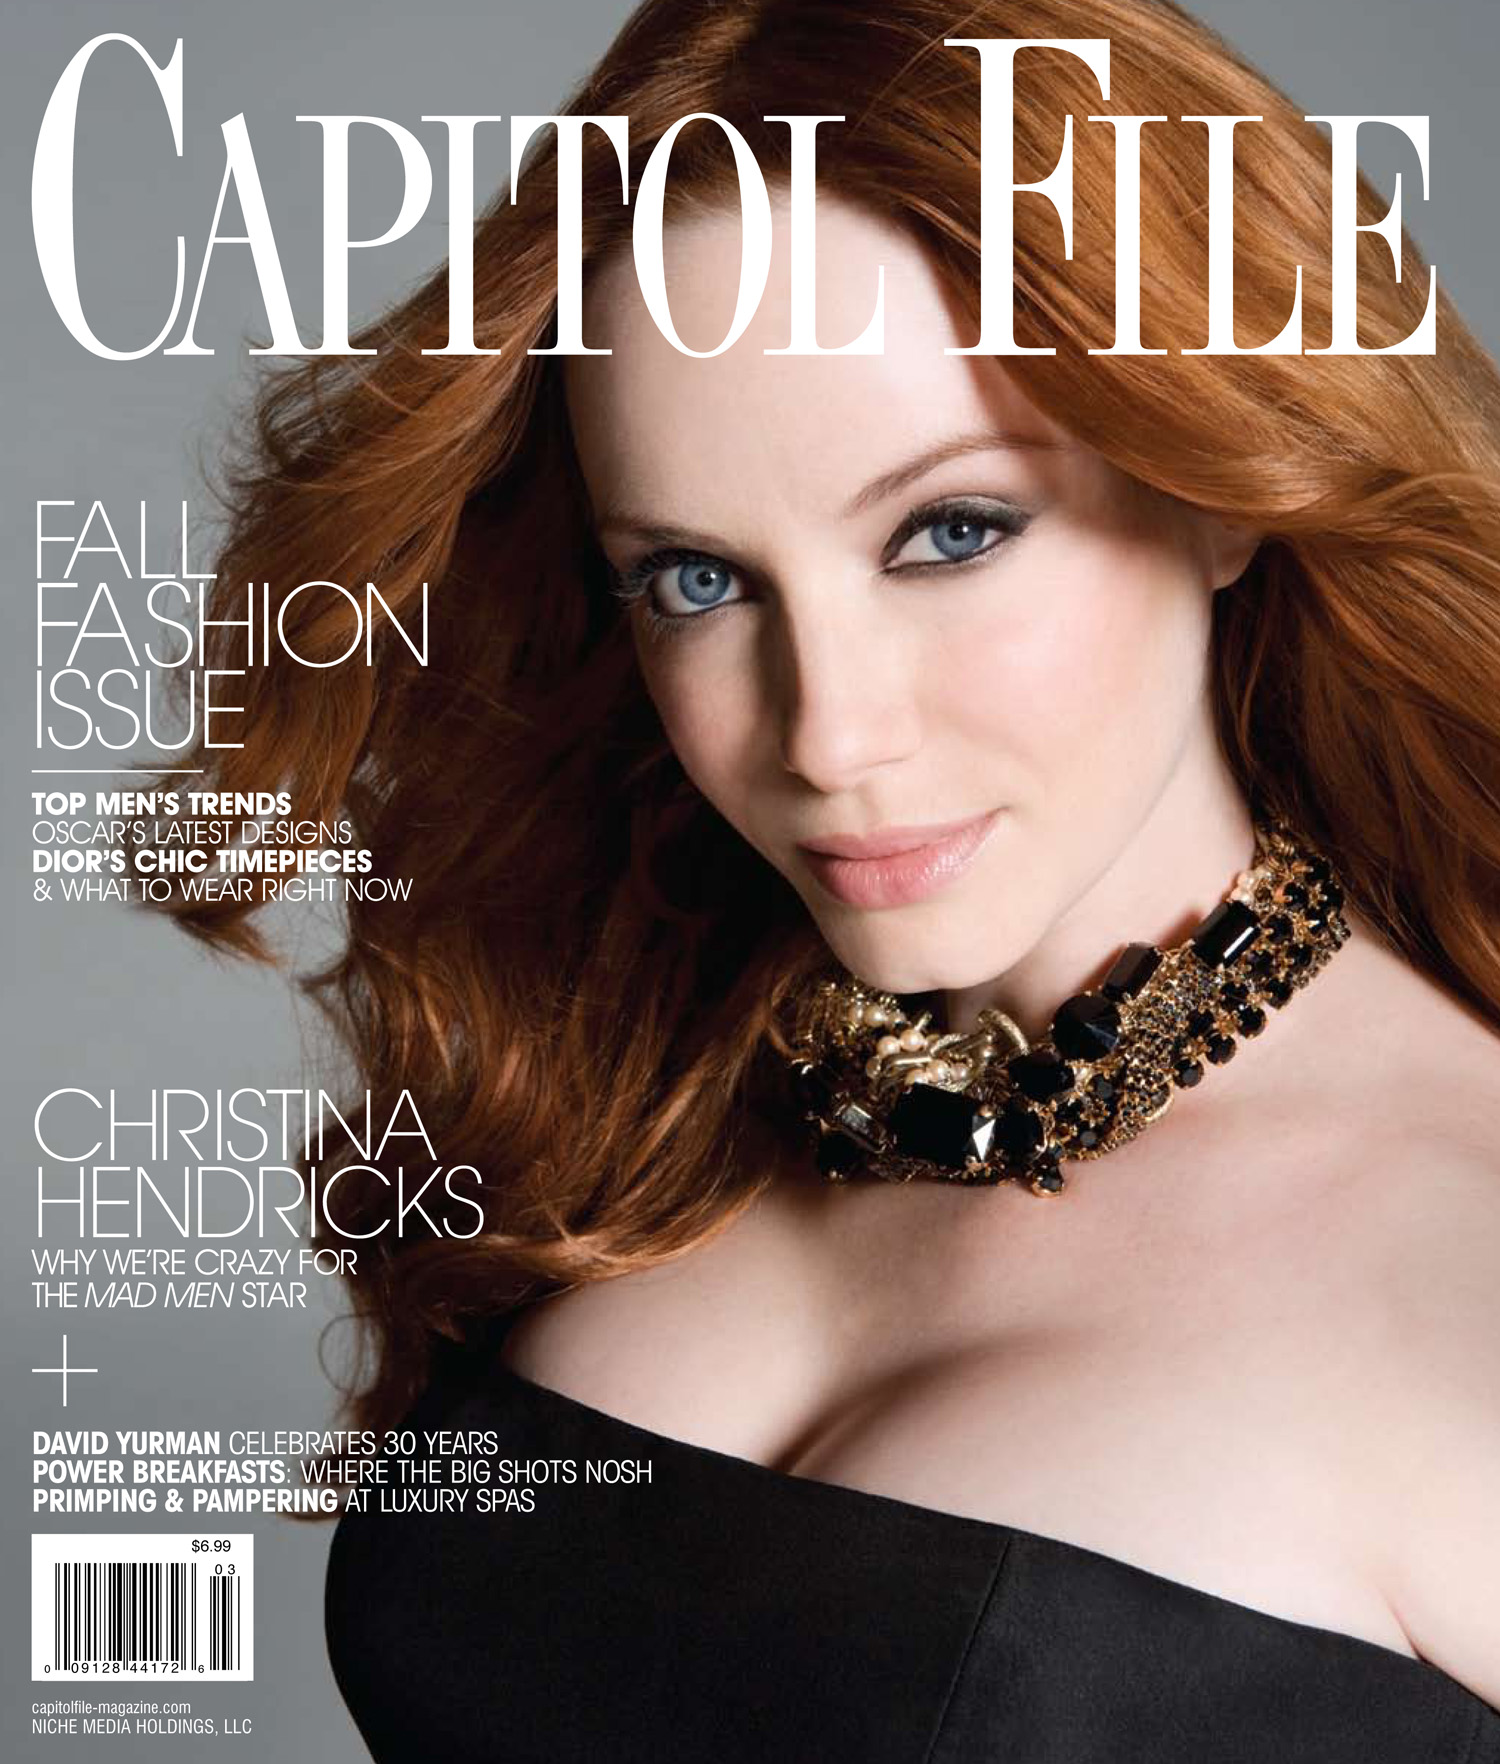 christina_hendricks_capitol_file_magazine.jpg